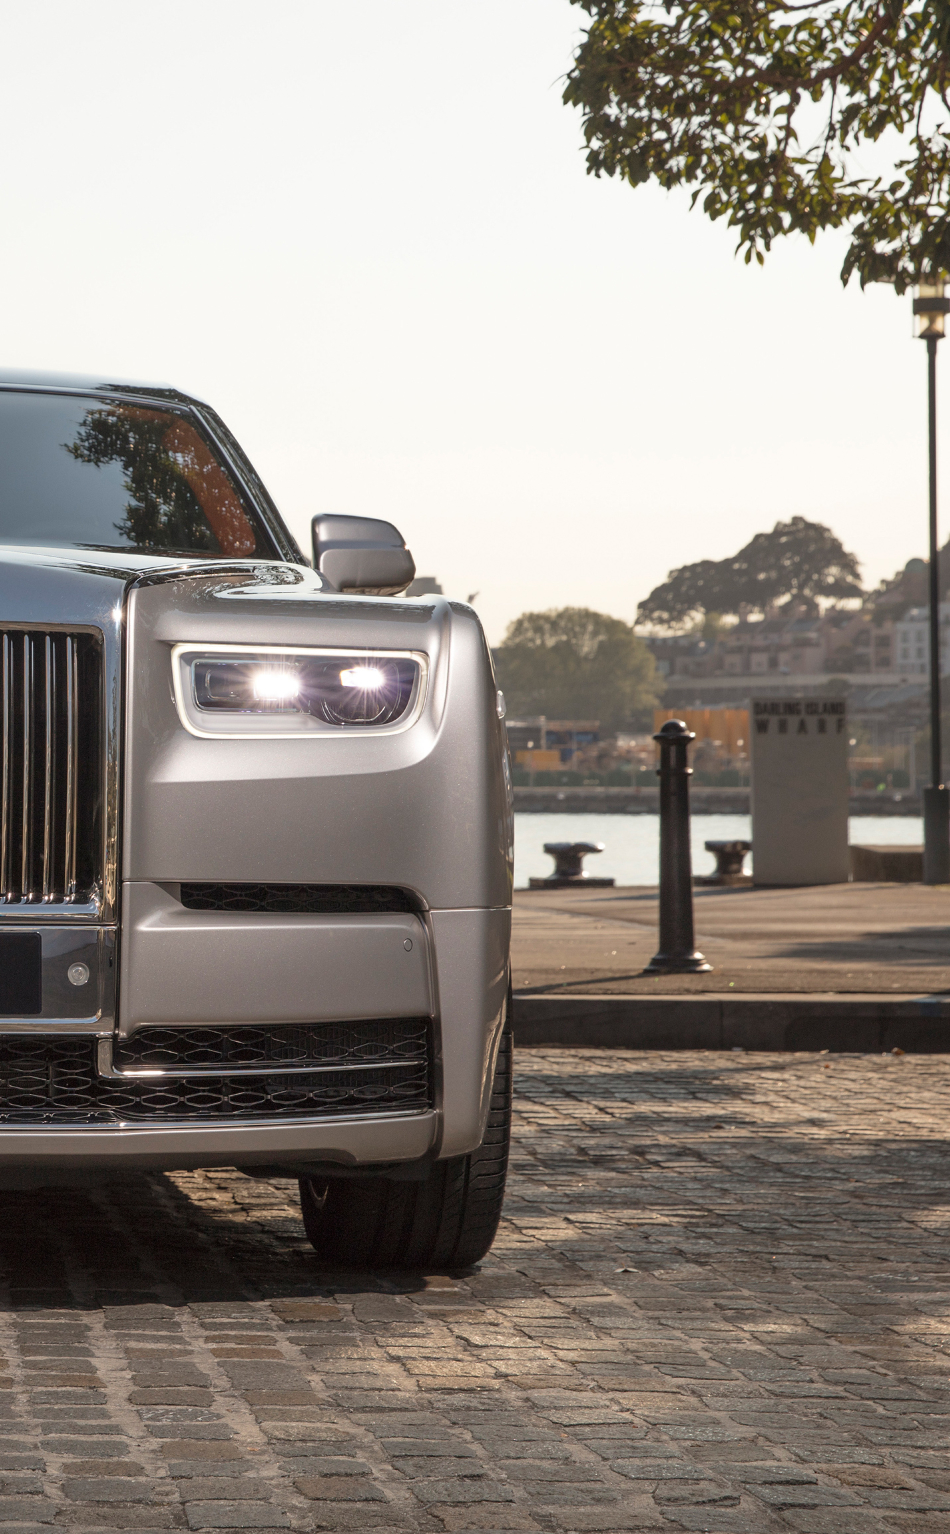 2018 Rolls Royce Phantom Hd 4k Wallpaper